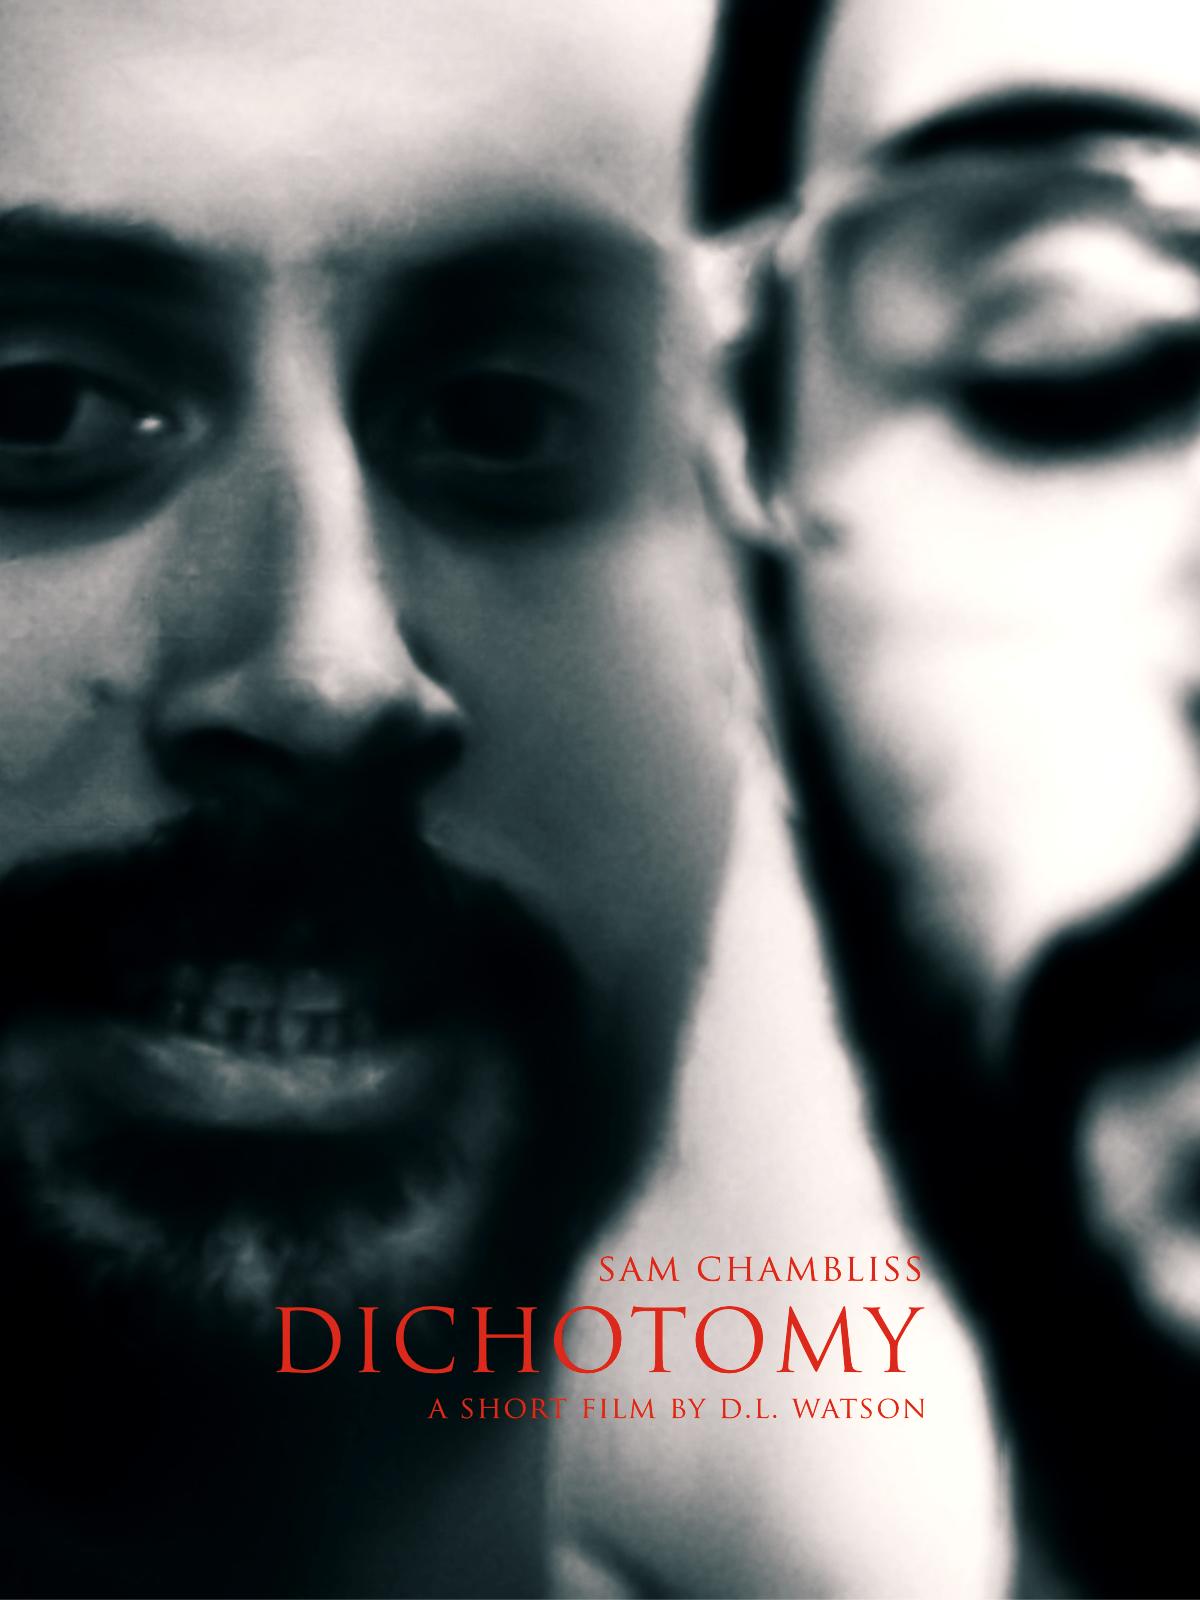 Dichotomy Poster.jpg